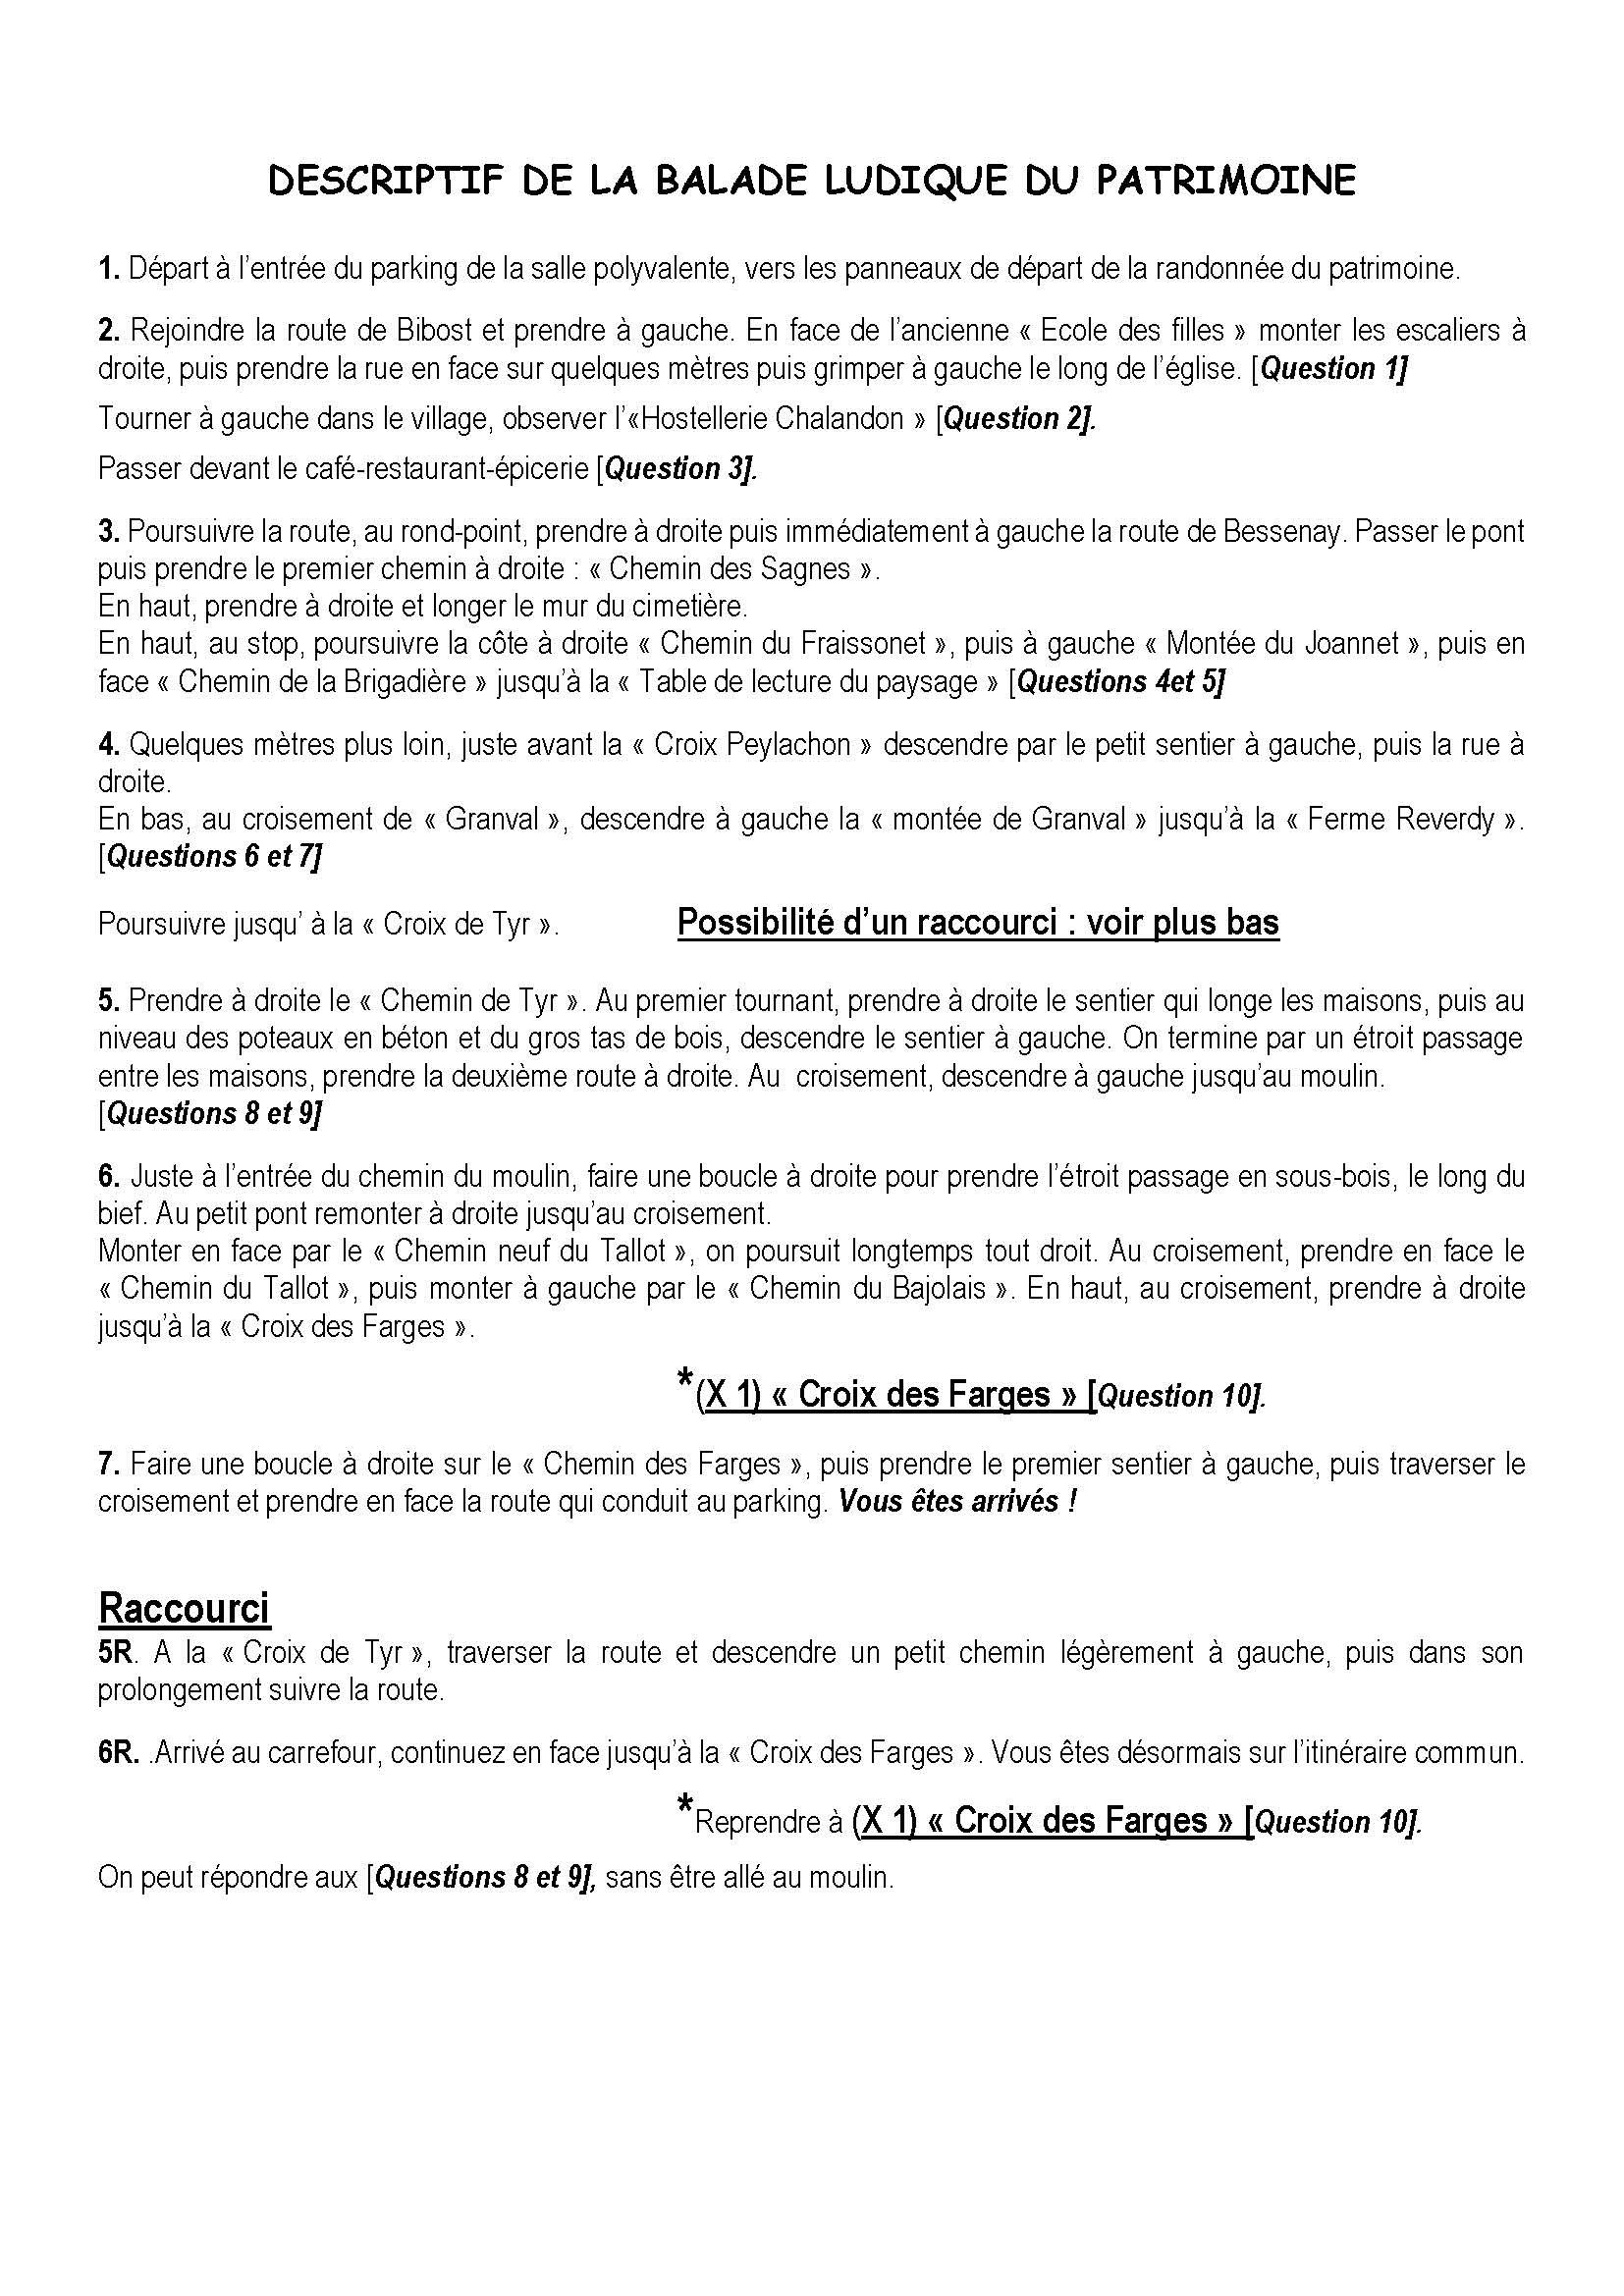 ballades ludiques itnineraire_Page_2.jpg